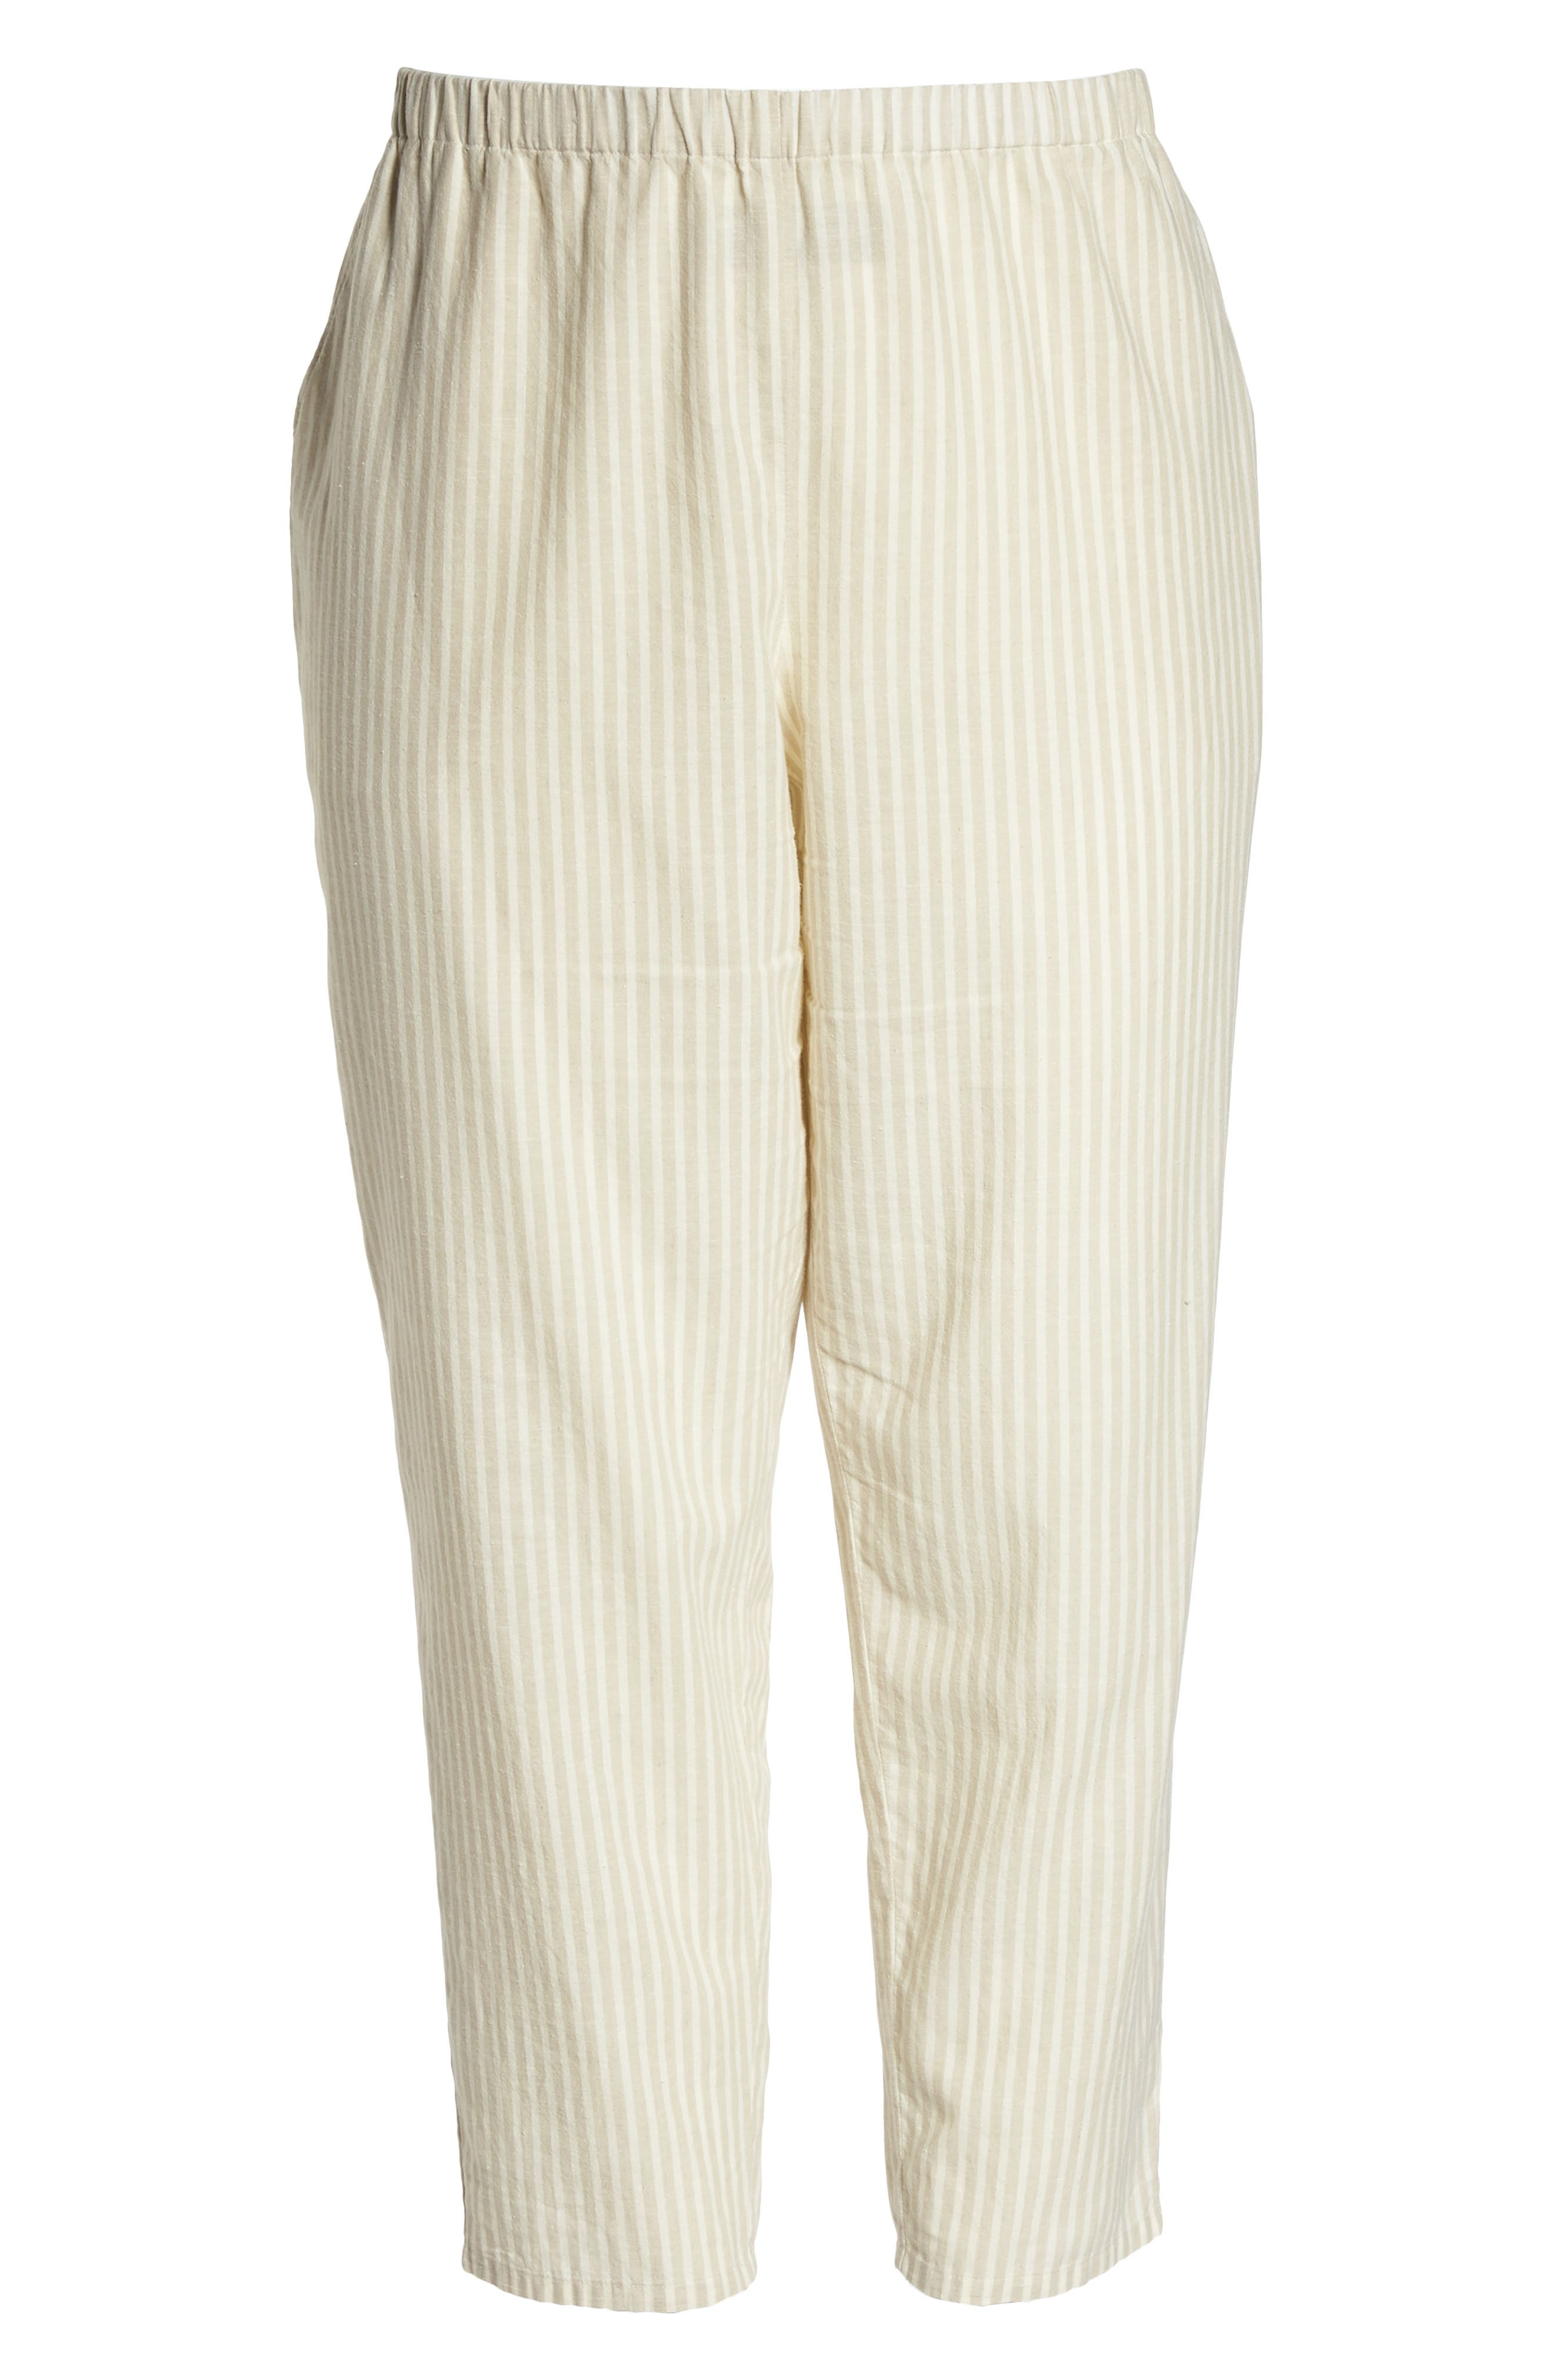 Stripe Ankle Hemp & Cotton Pants,                             Alternate thumbnail 7, color,                             257